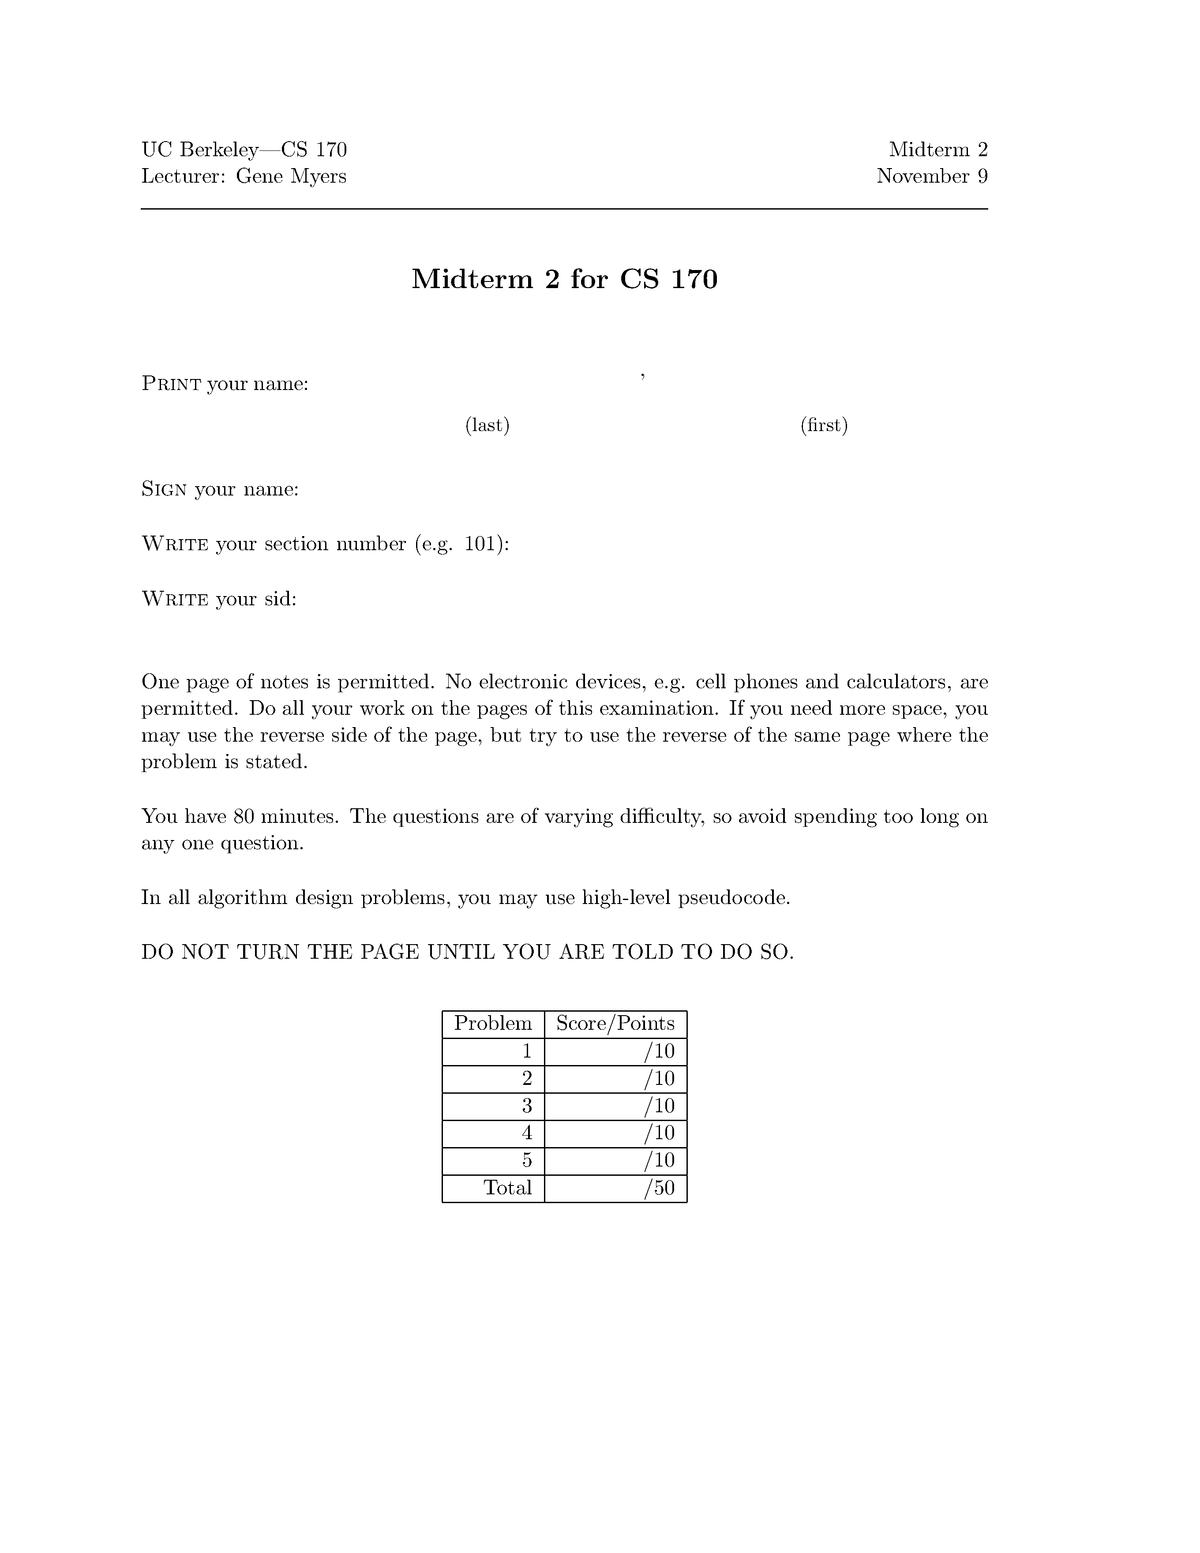 Exam 2004 - COMPSCI 170: Efficient Algorithms And